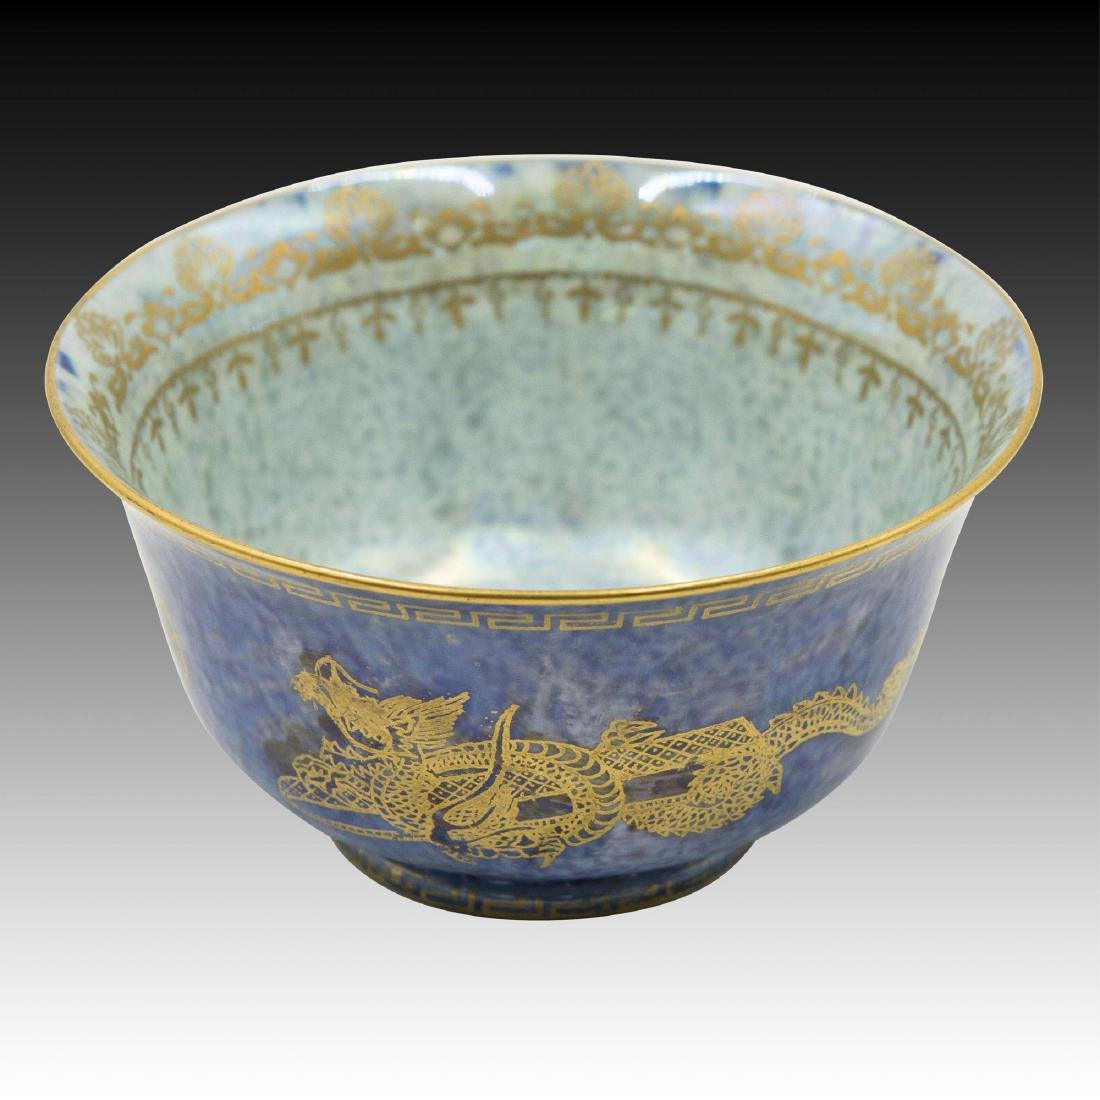 Wedgwood Fairyland Lustre Gold Dragon Bowl